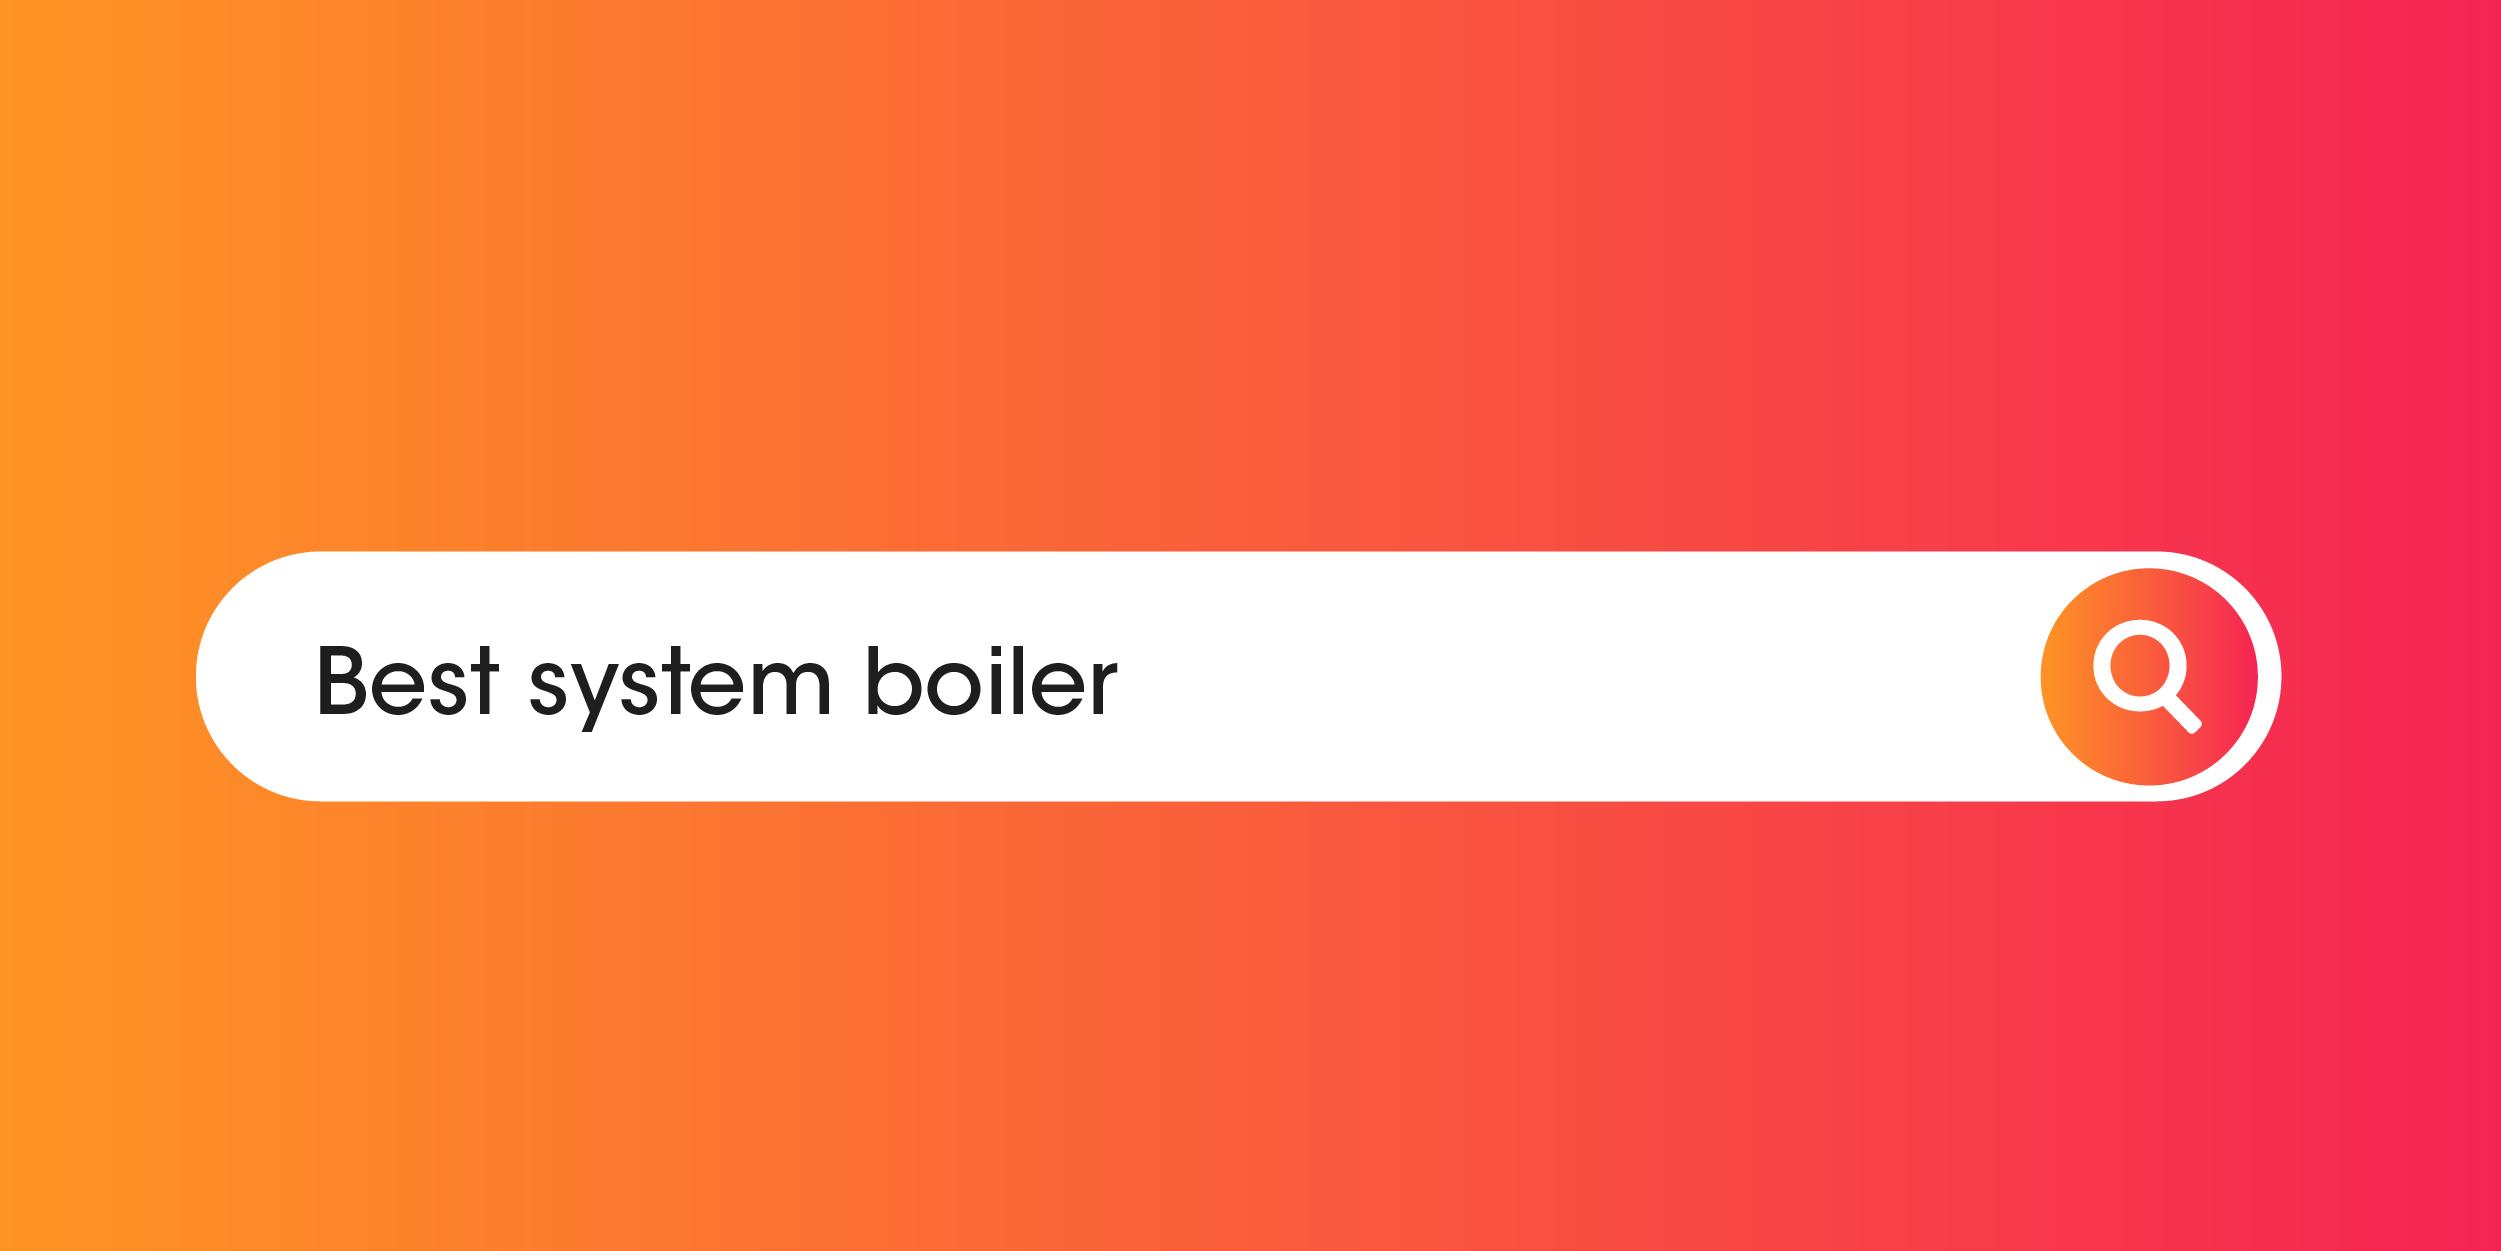 Best system boiler